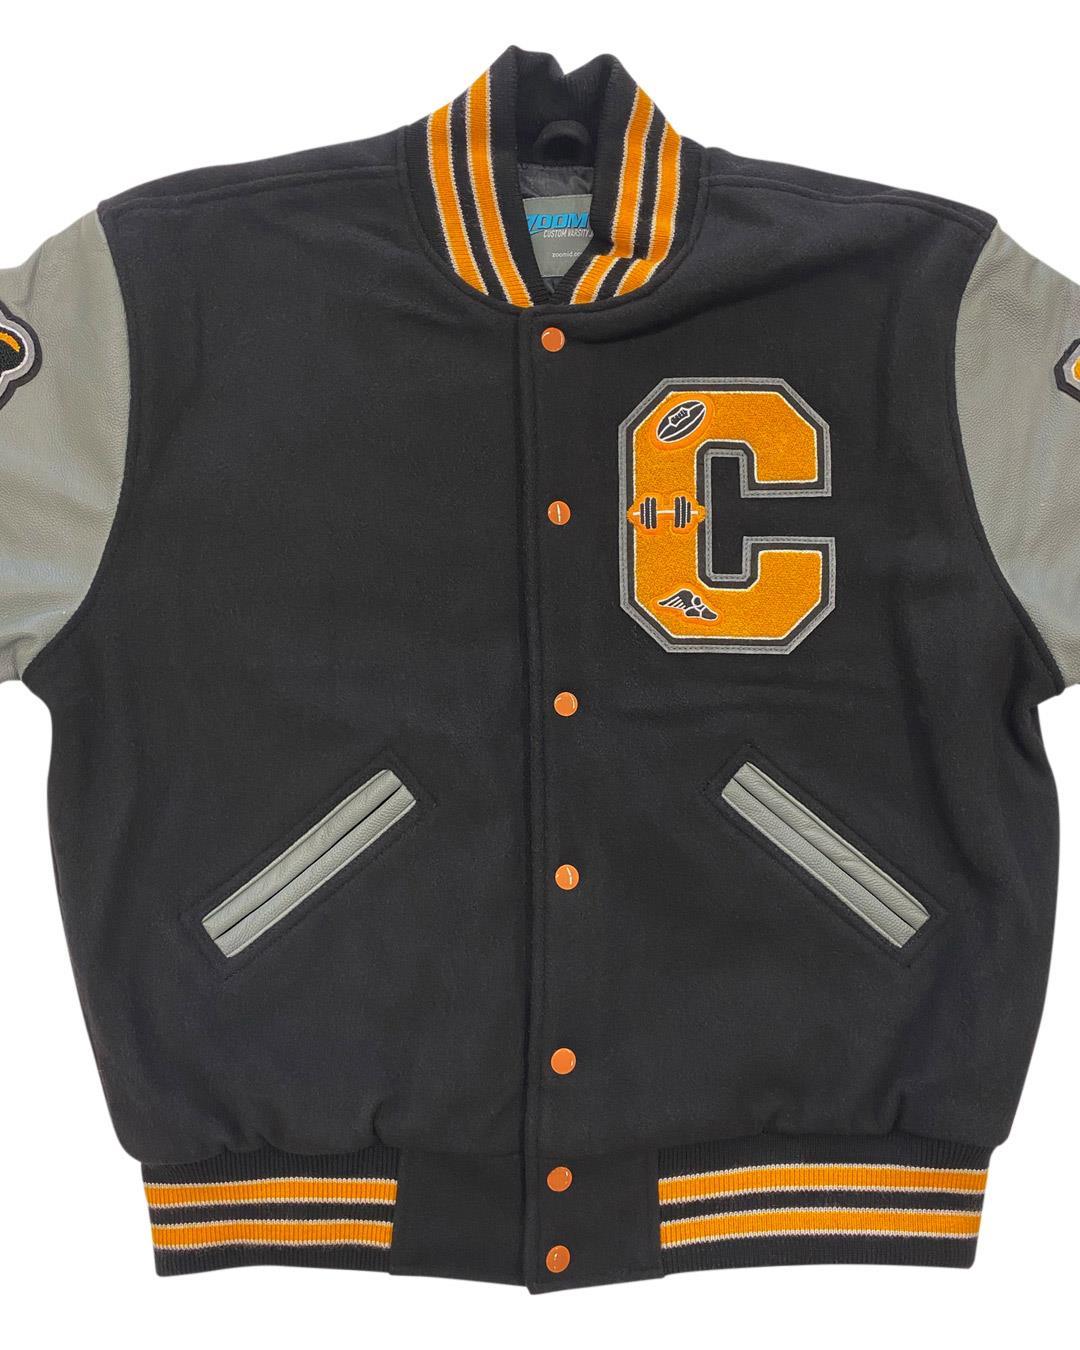 Caddo High School Varsity Jacket, Caddo OK